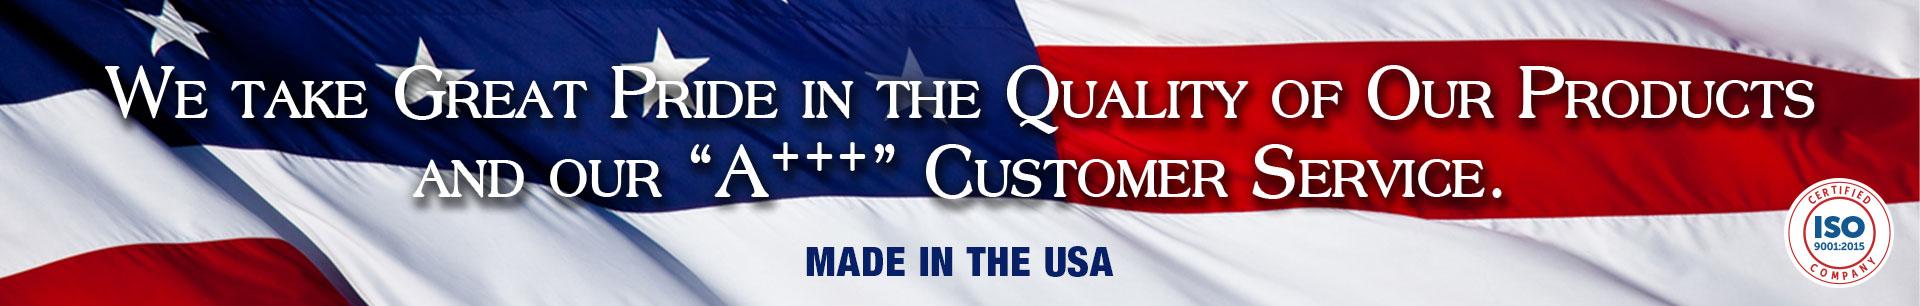 USA-Industries-Inc-Great-Pride-Customer-Service